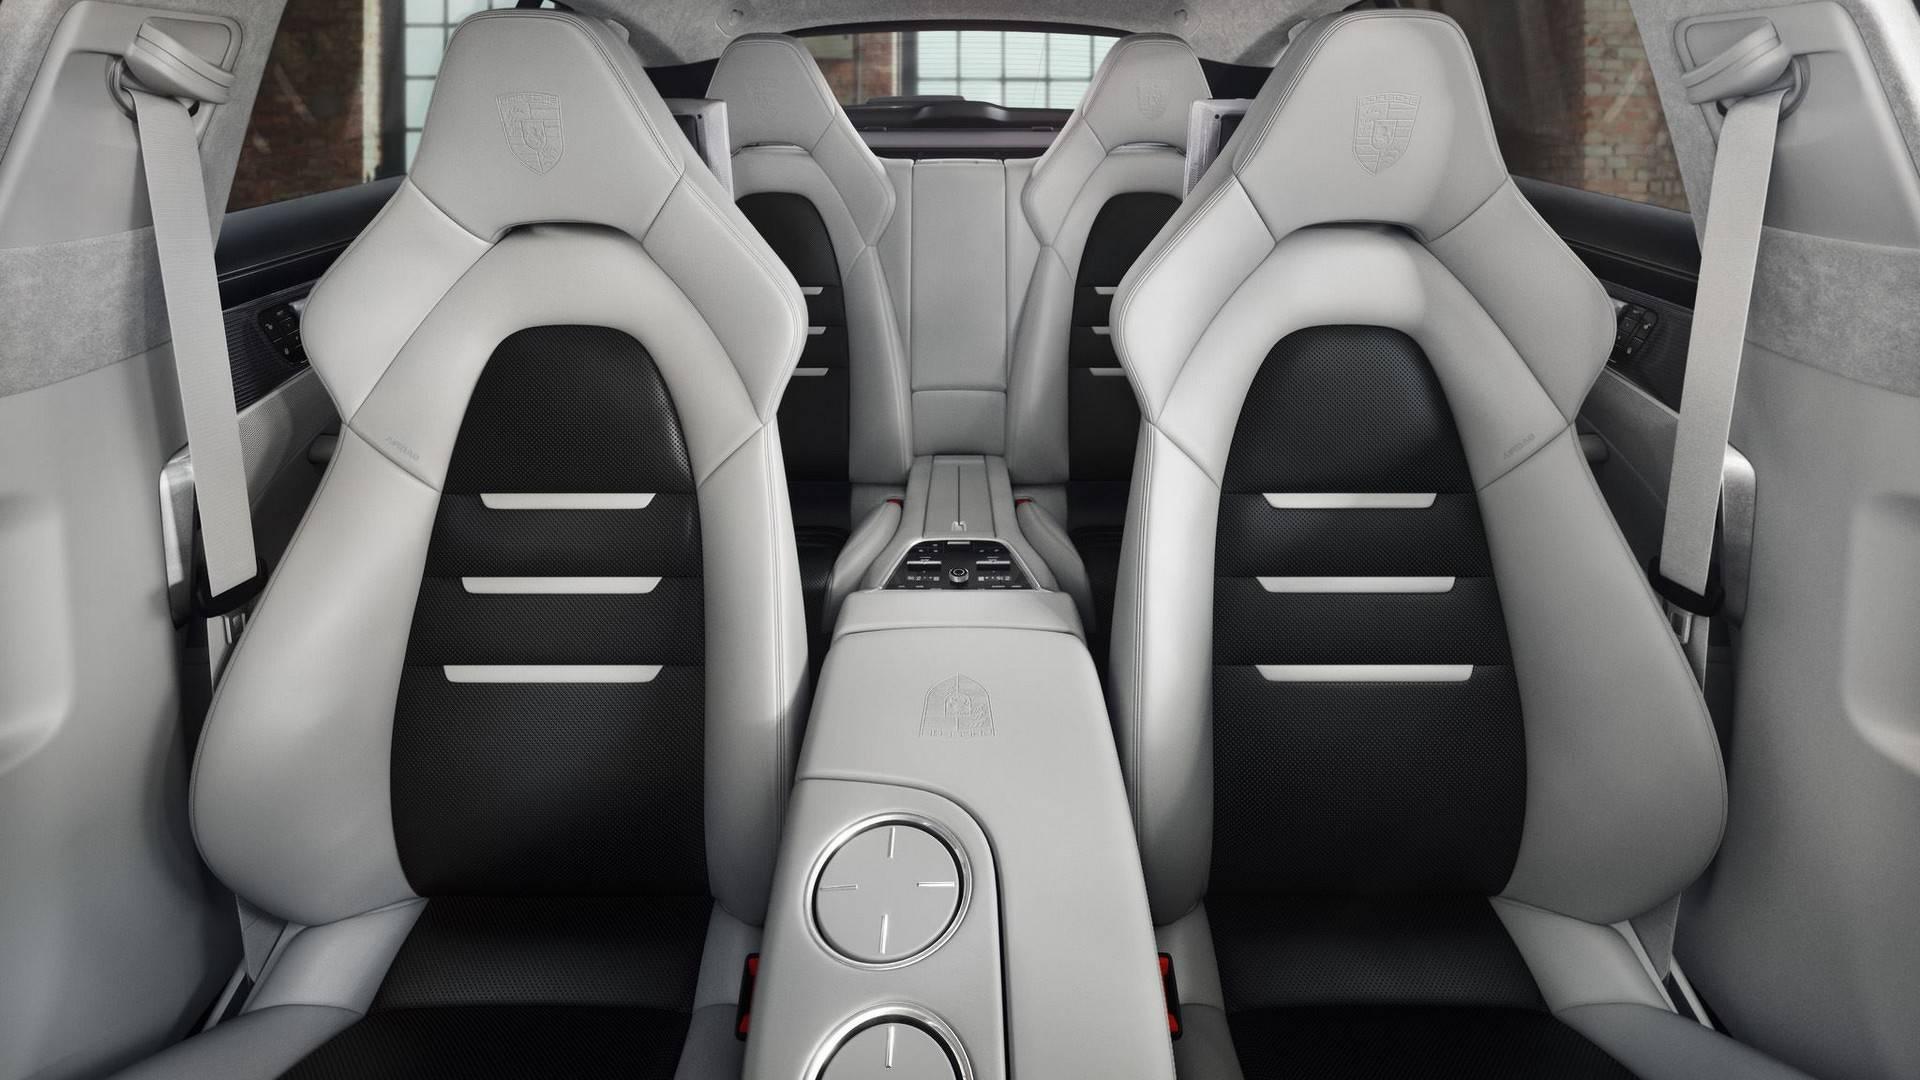 Porsche Panamera Turbo S E Hybrid Sport Turismo In Amethyst Metallic 2389038